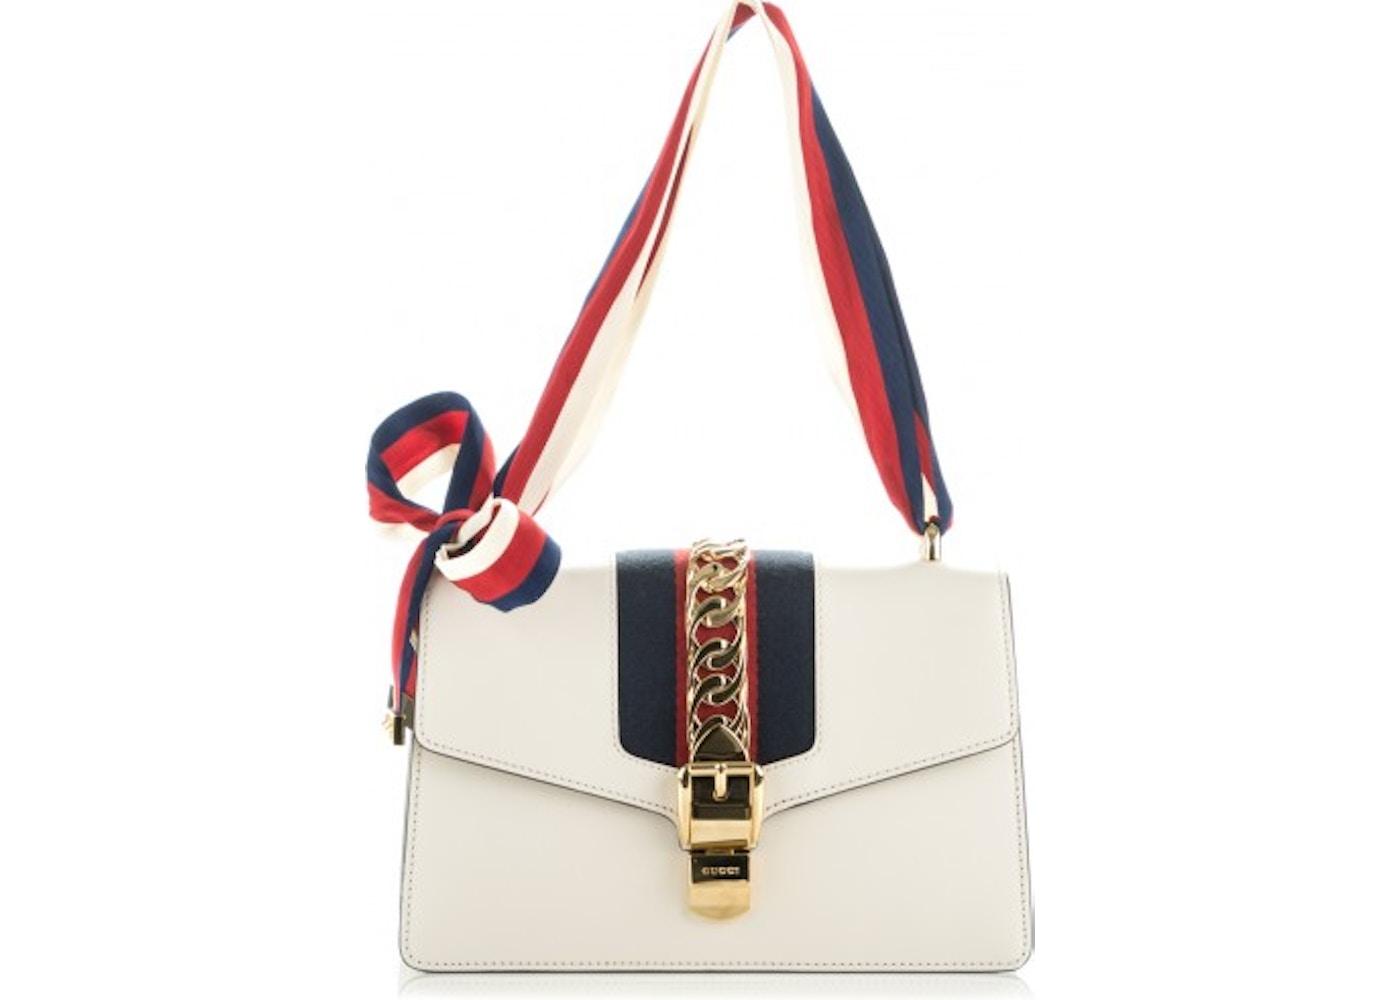 2c379904cfc98 Buy   Sell Gucci Other Handbags - Highest Bid